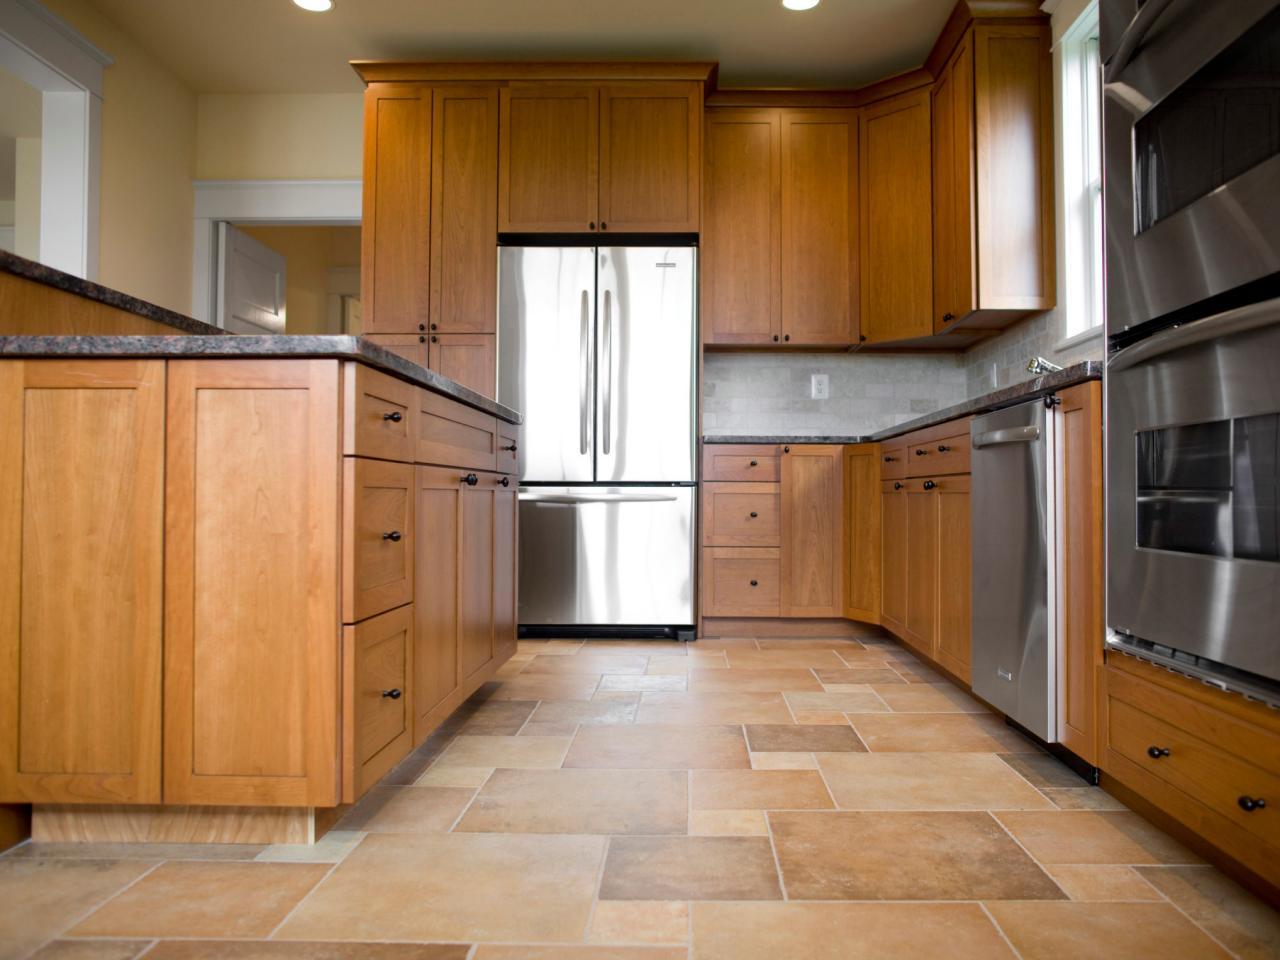 kitchen flooring options related to: kitchen flooring flooring kitchens LNNJUHS